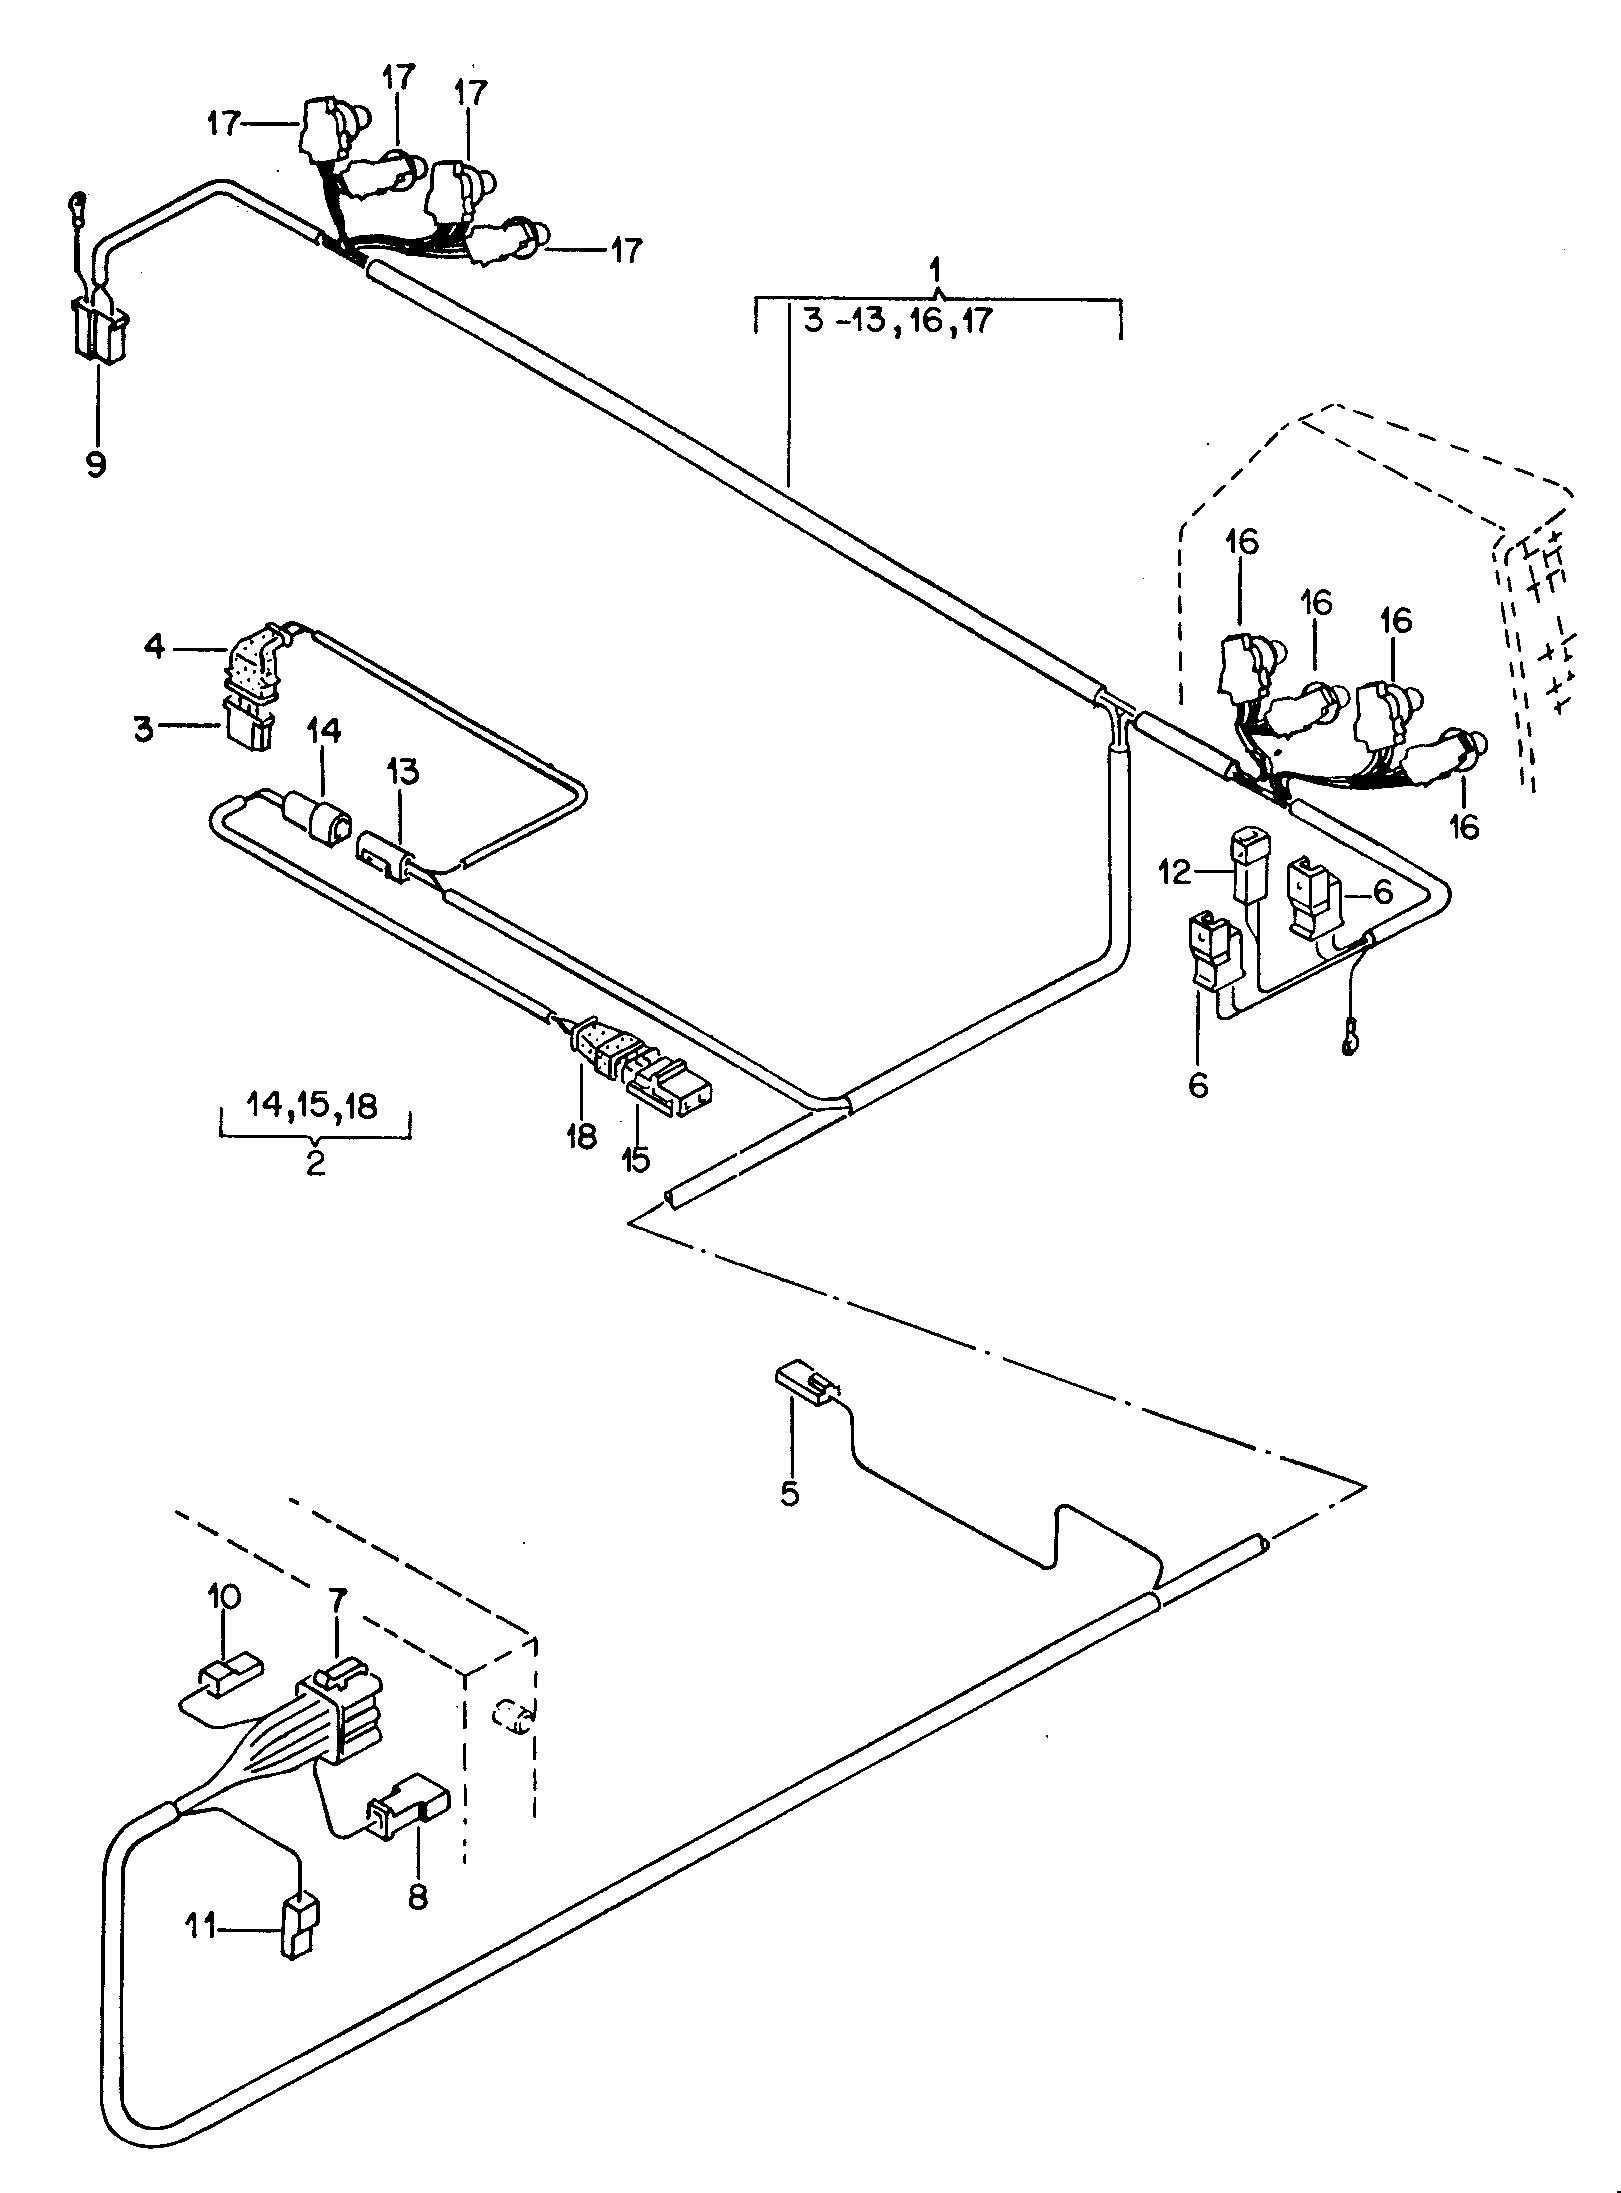 2001 volkswagen pat parts diagram 2001 volkswagen pat parts diagram scion scion tc